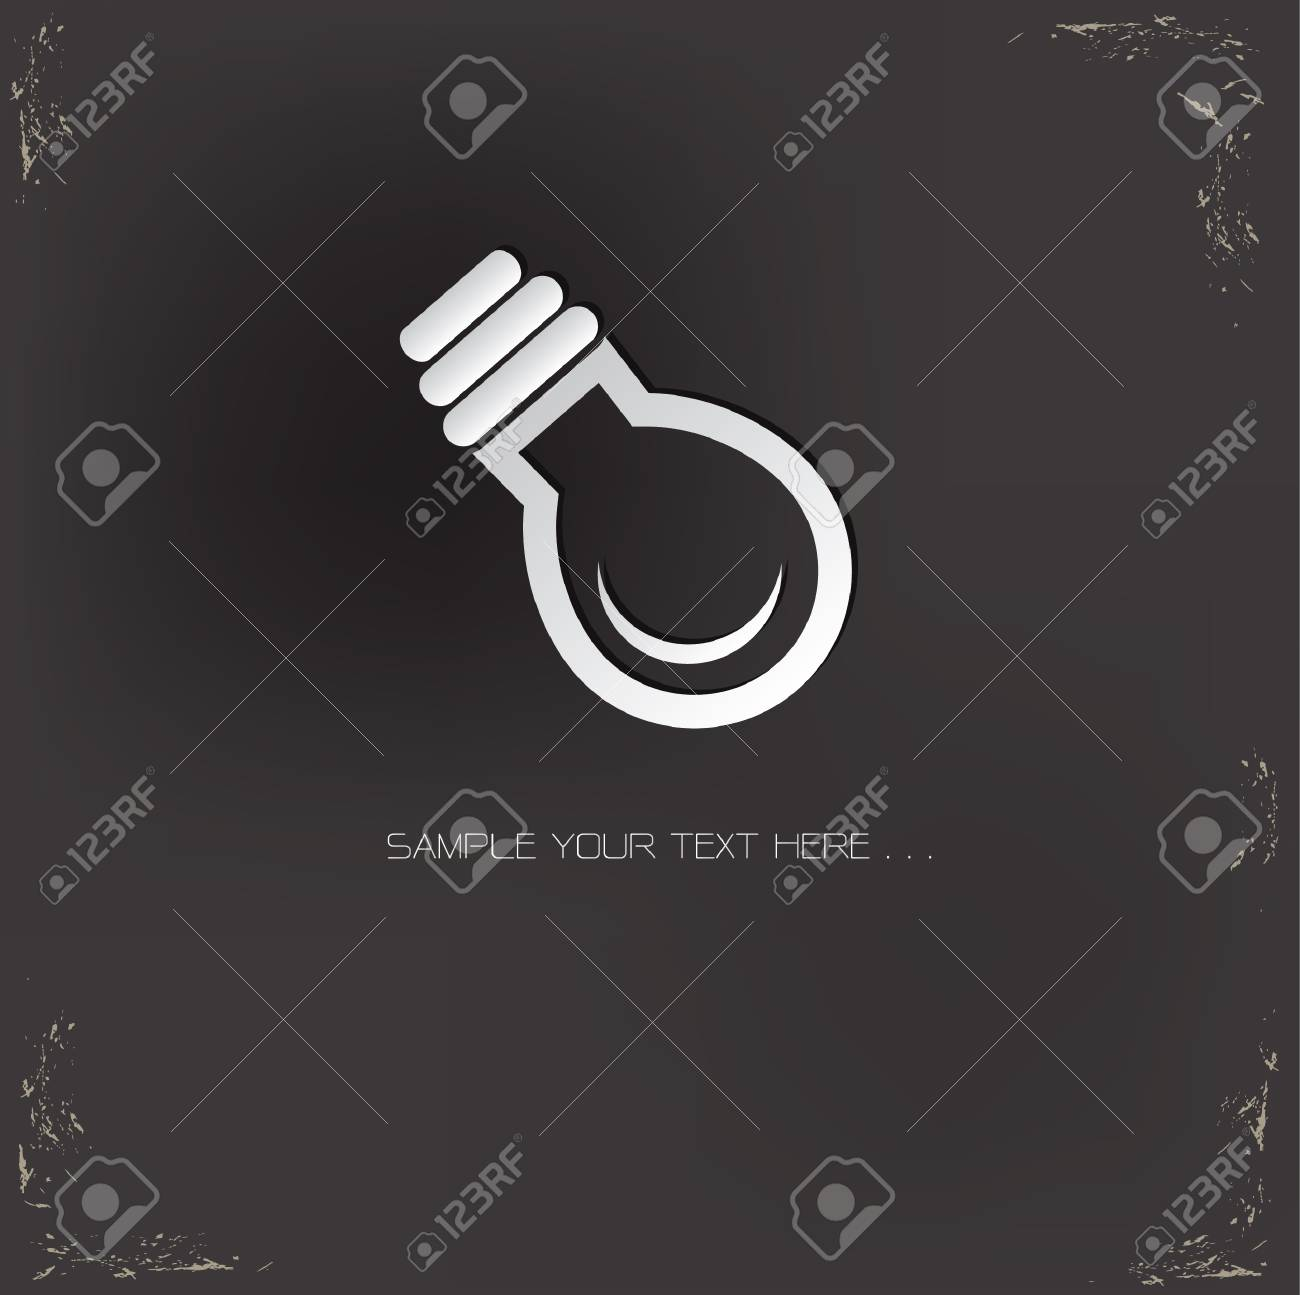 Light bulb sign on grunge background Stock Vector - 20564871